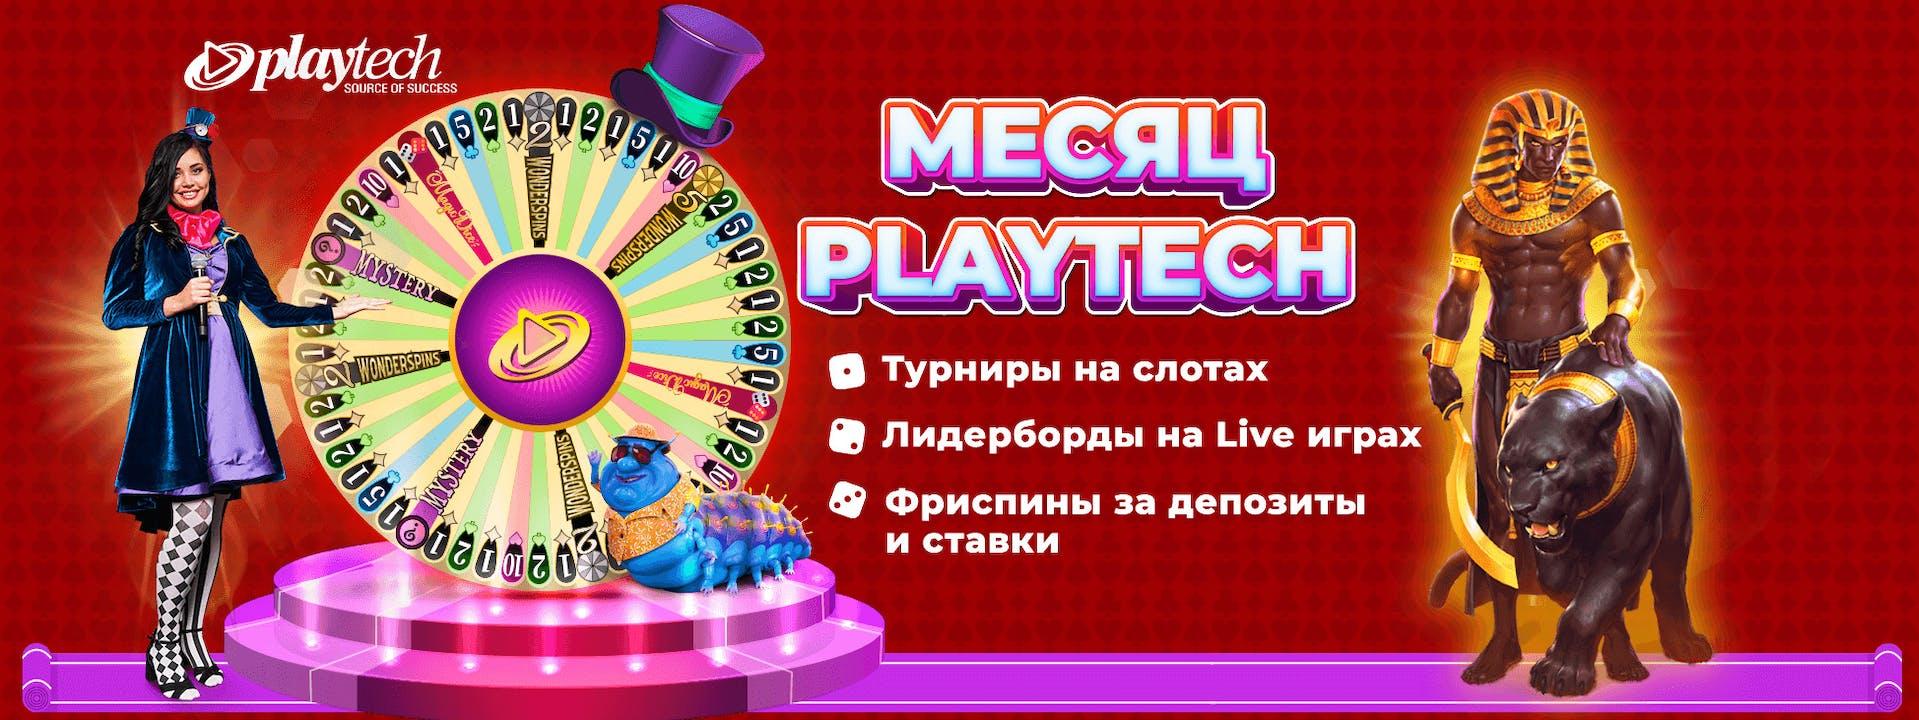 Месяц Playtech